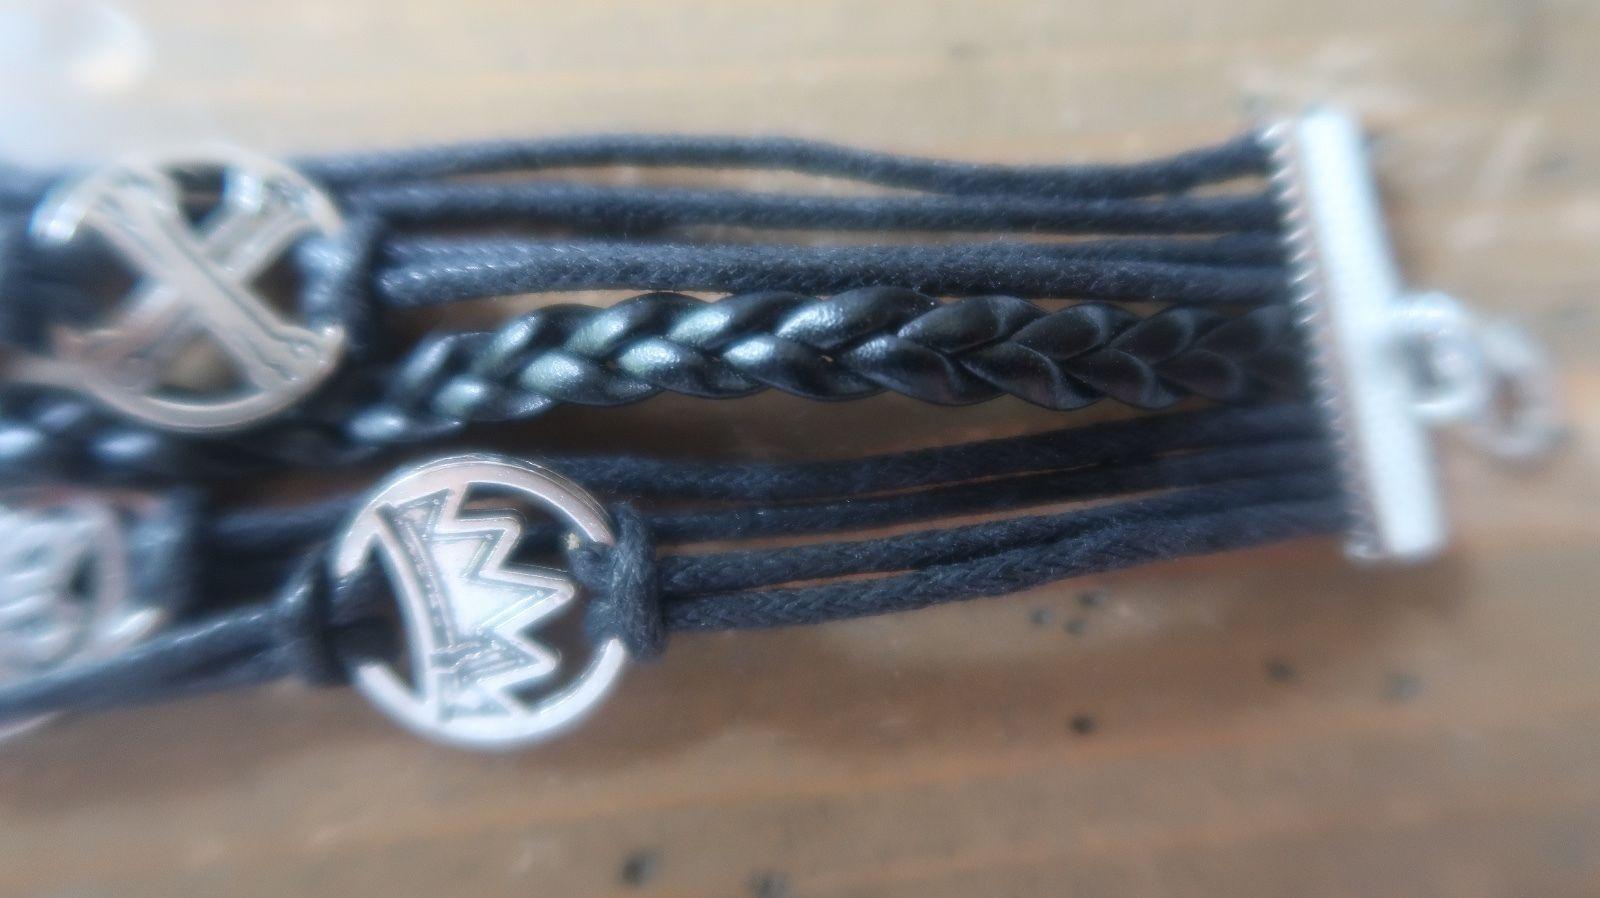 2005 Disney Leather Bracelet 6.25 inches